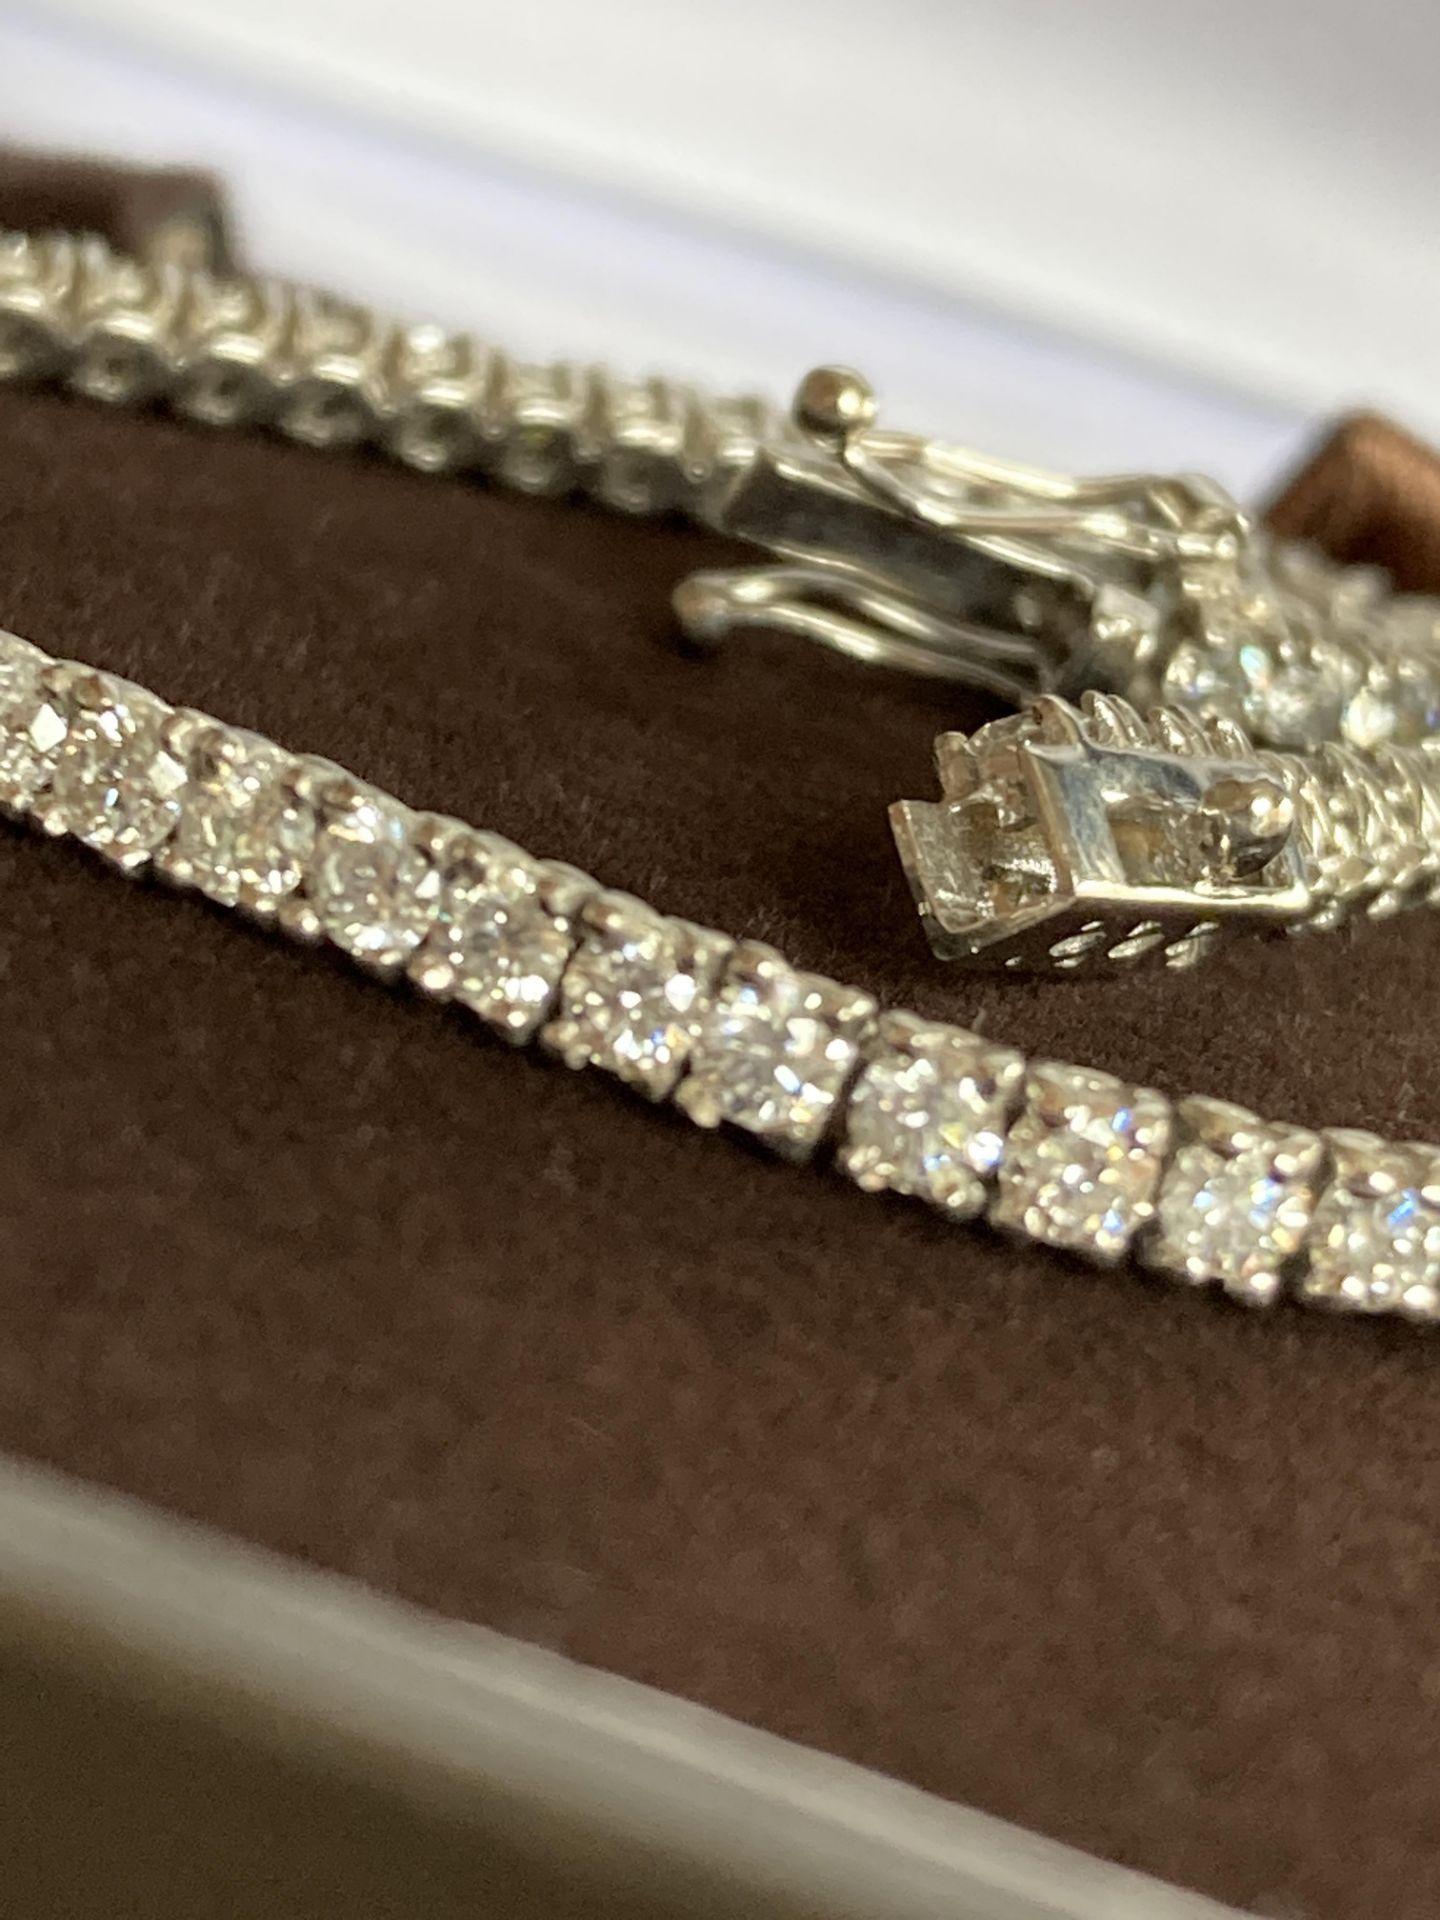 18CT WHITE GOLD 3.2-3.5CT DIAMOND TENNIS BRACELET - Image 3 of 4